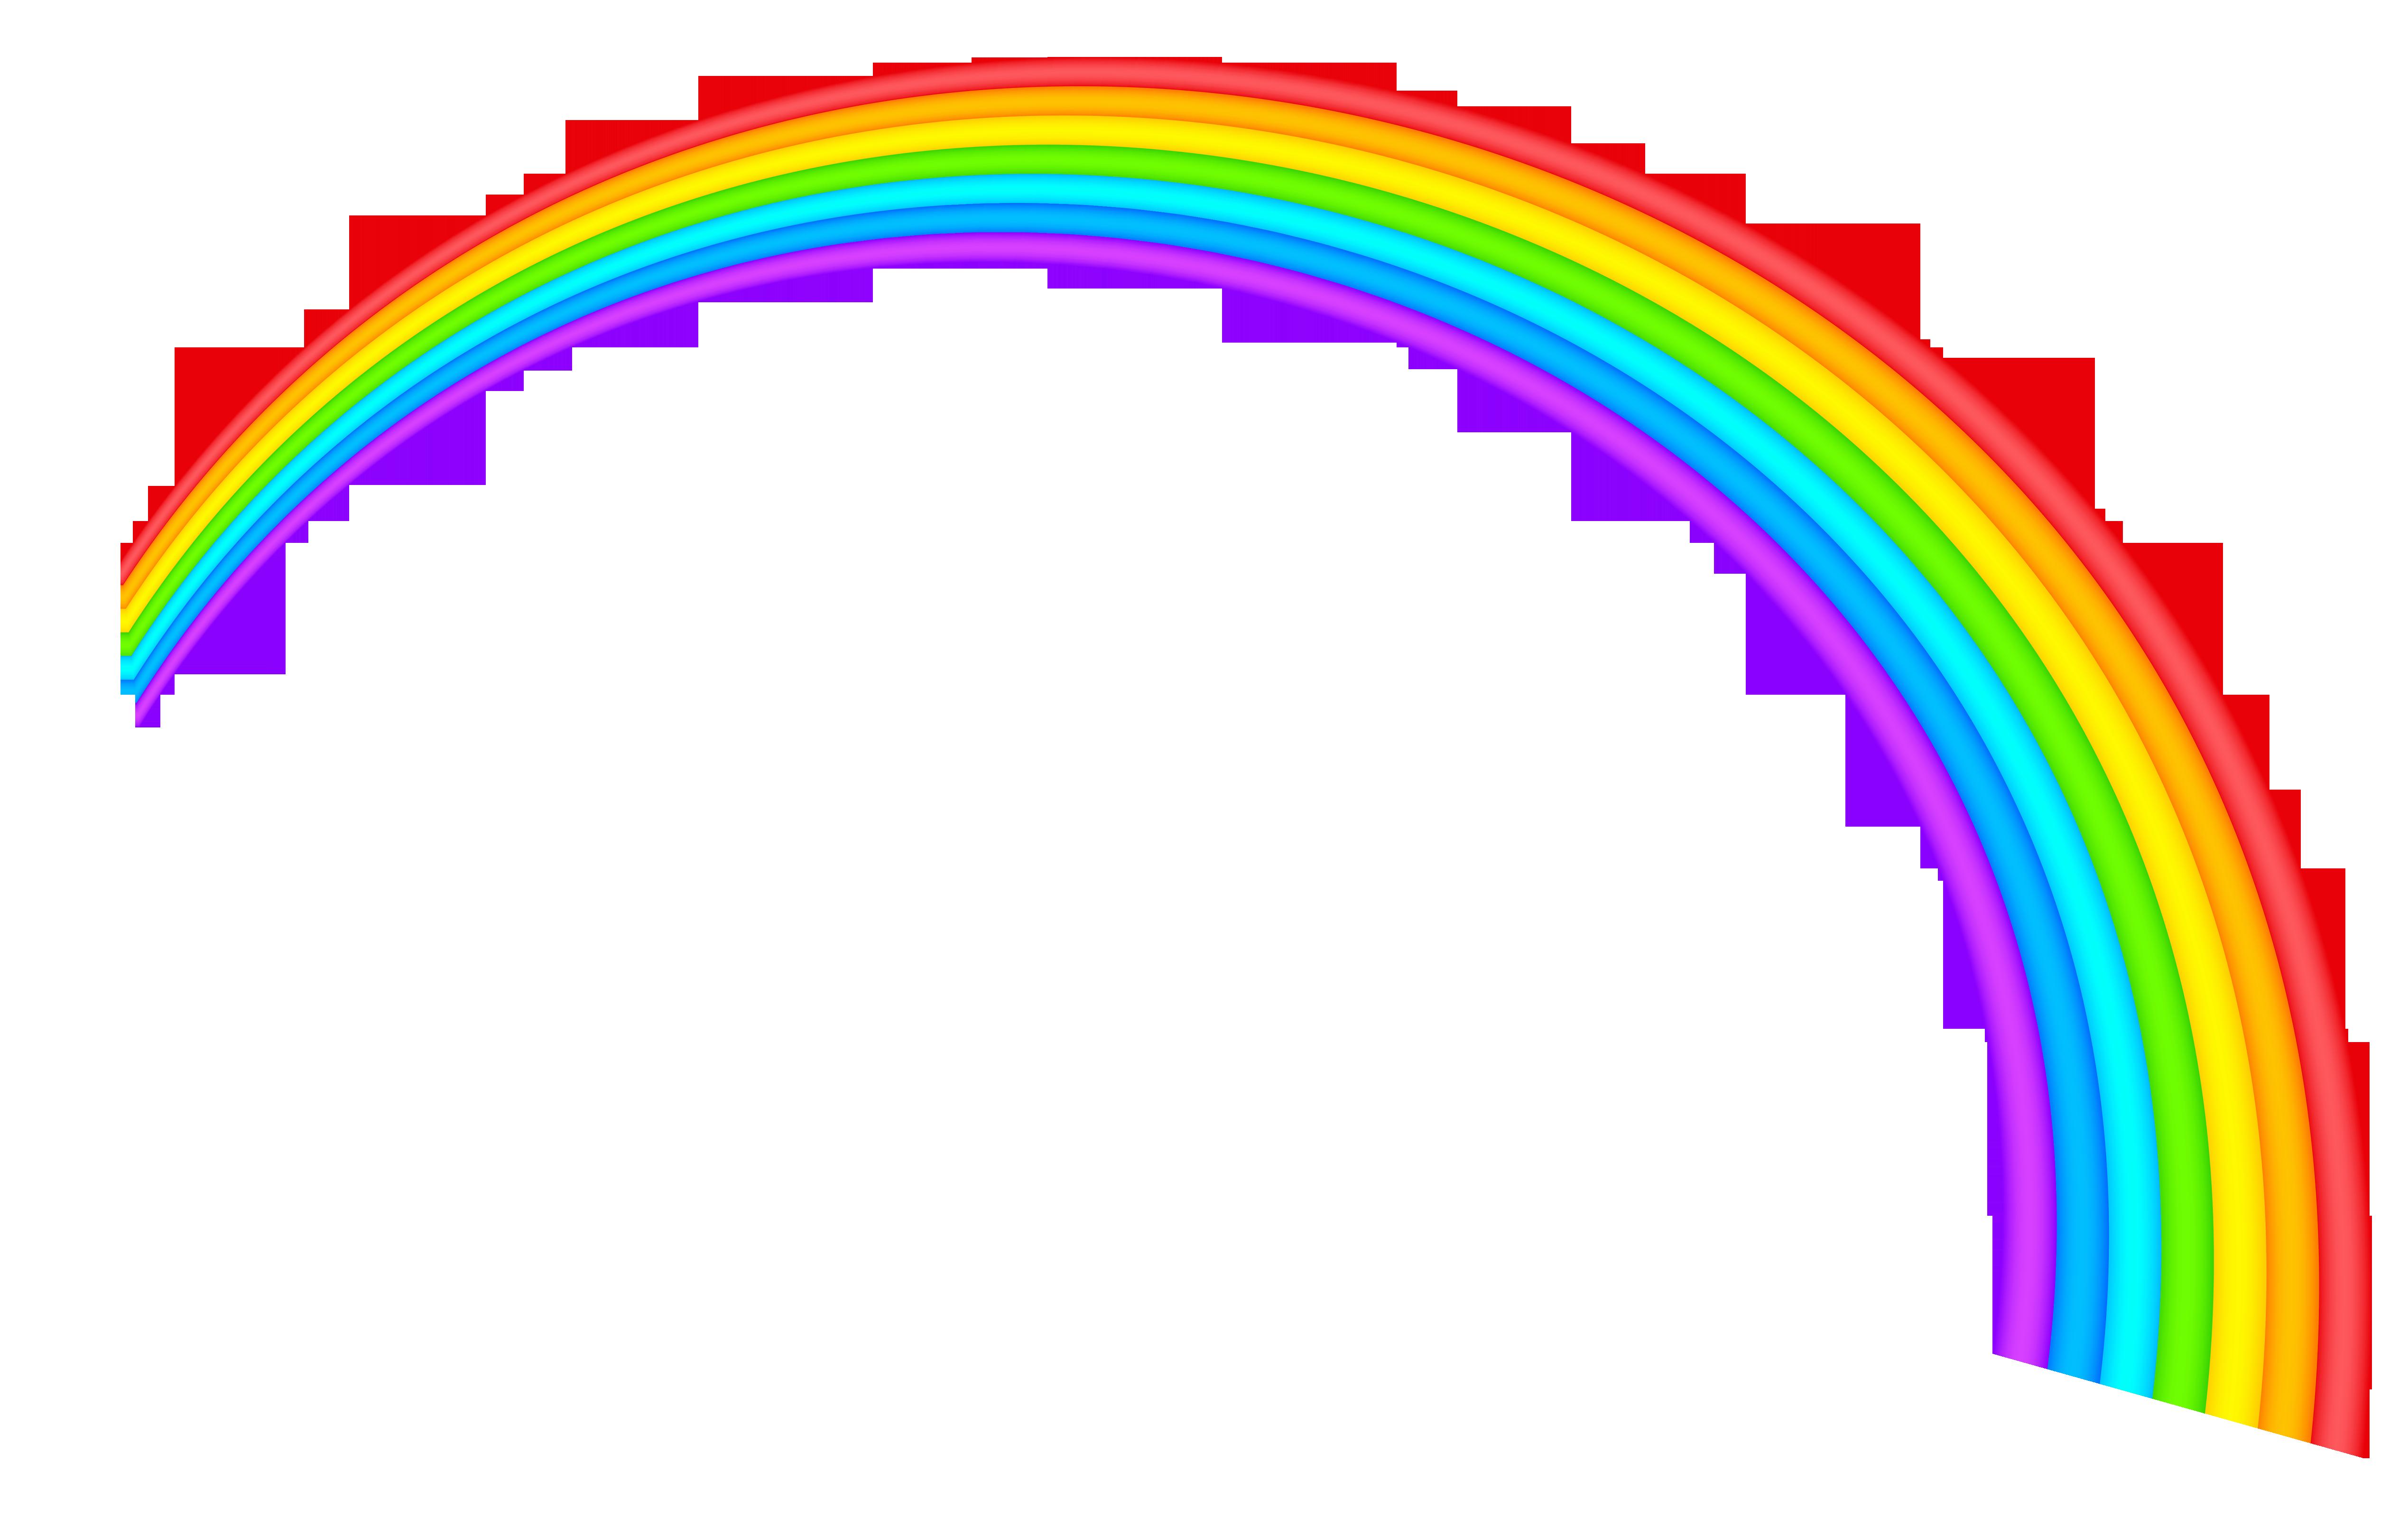 5076x3239 Free Rainbow Clipart Public Domain Rainbow Clip Art Images And 3